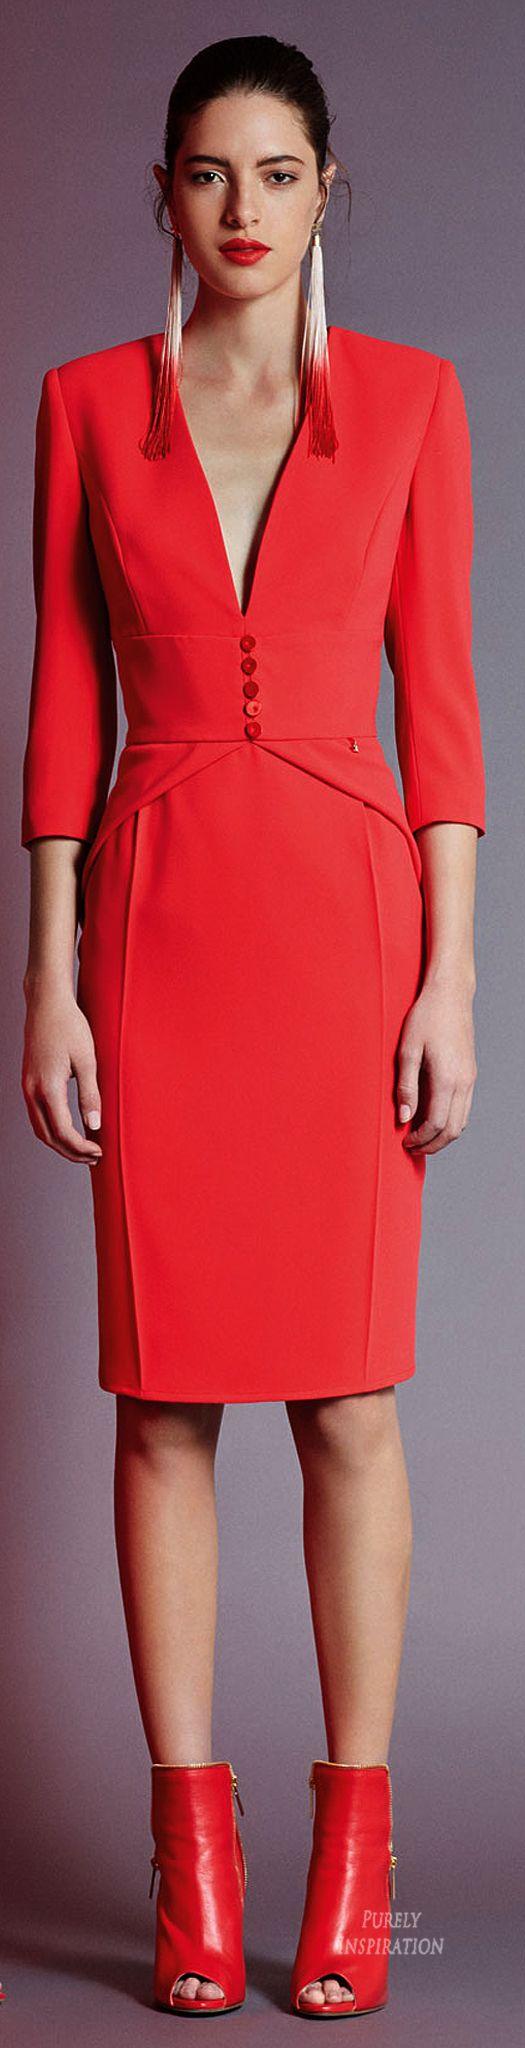 Elisabetta Franchi FW2015 Women's Office  Fashion RTW | Purely Inspiration